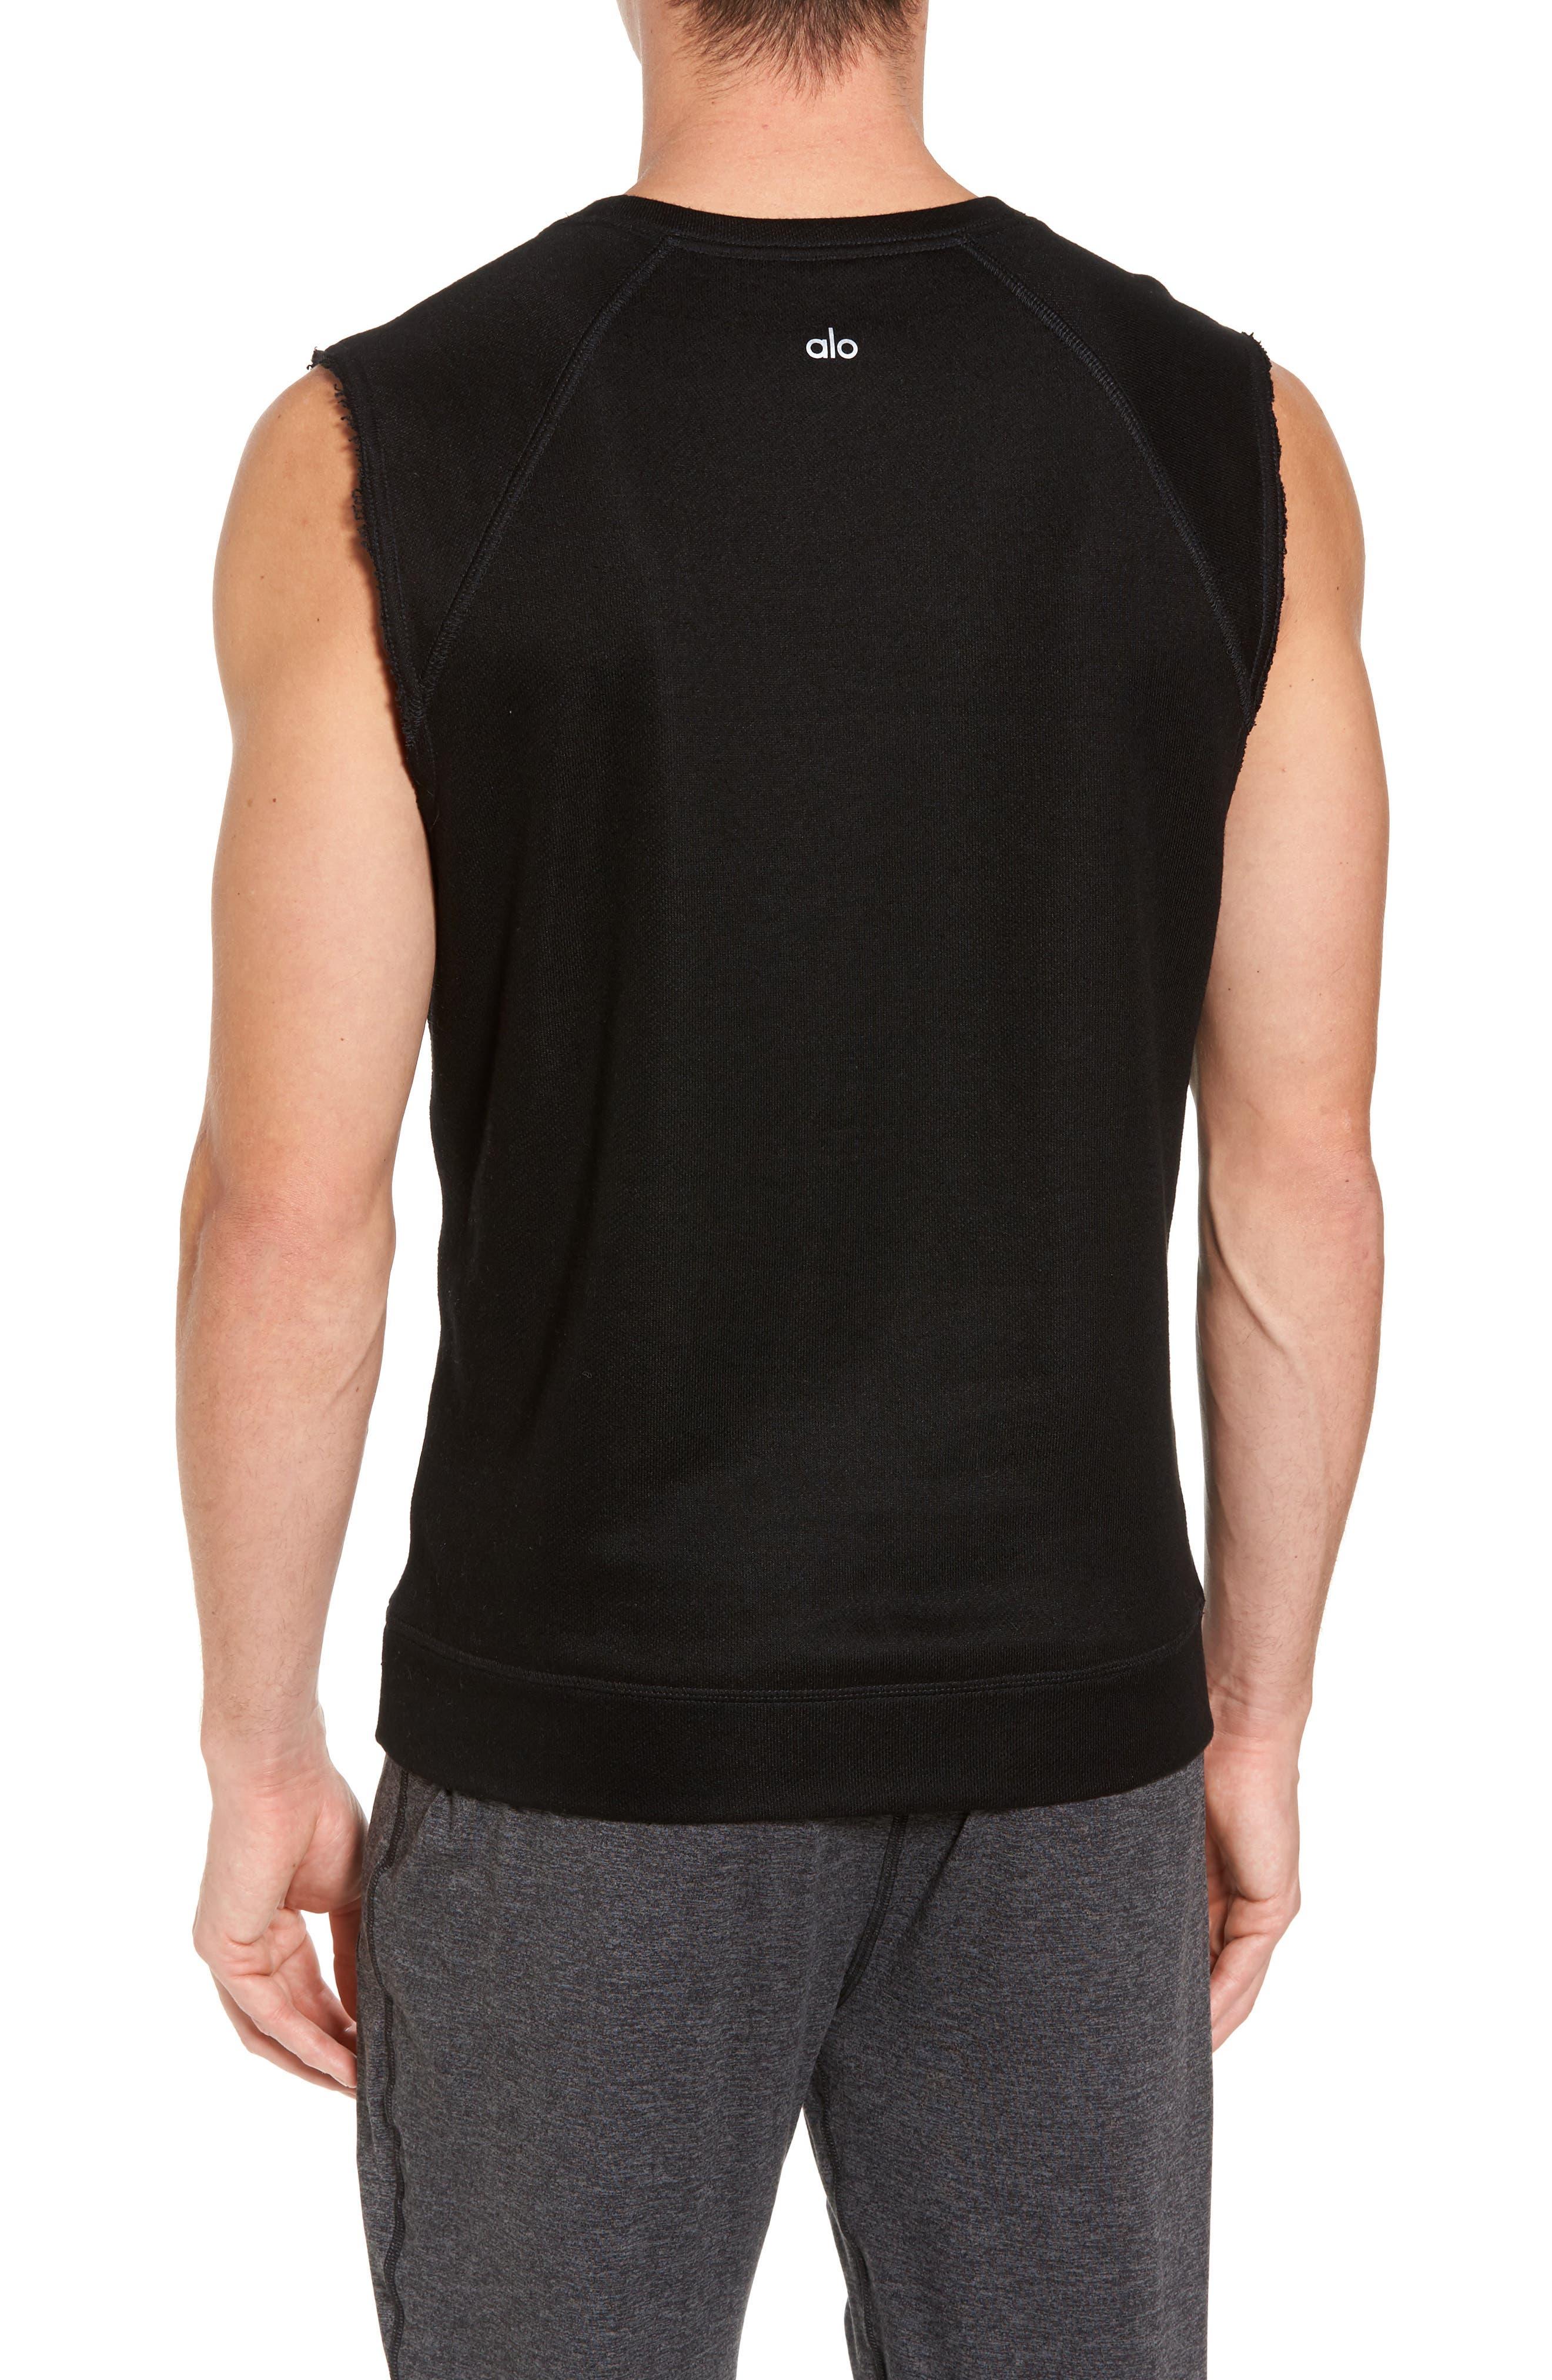 Dosha Relaxed Fit Sweatshirt Tank,                             Alternate thumbnail 2, color,                             BLACK